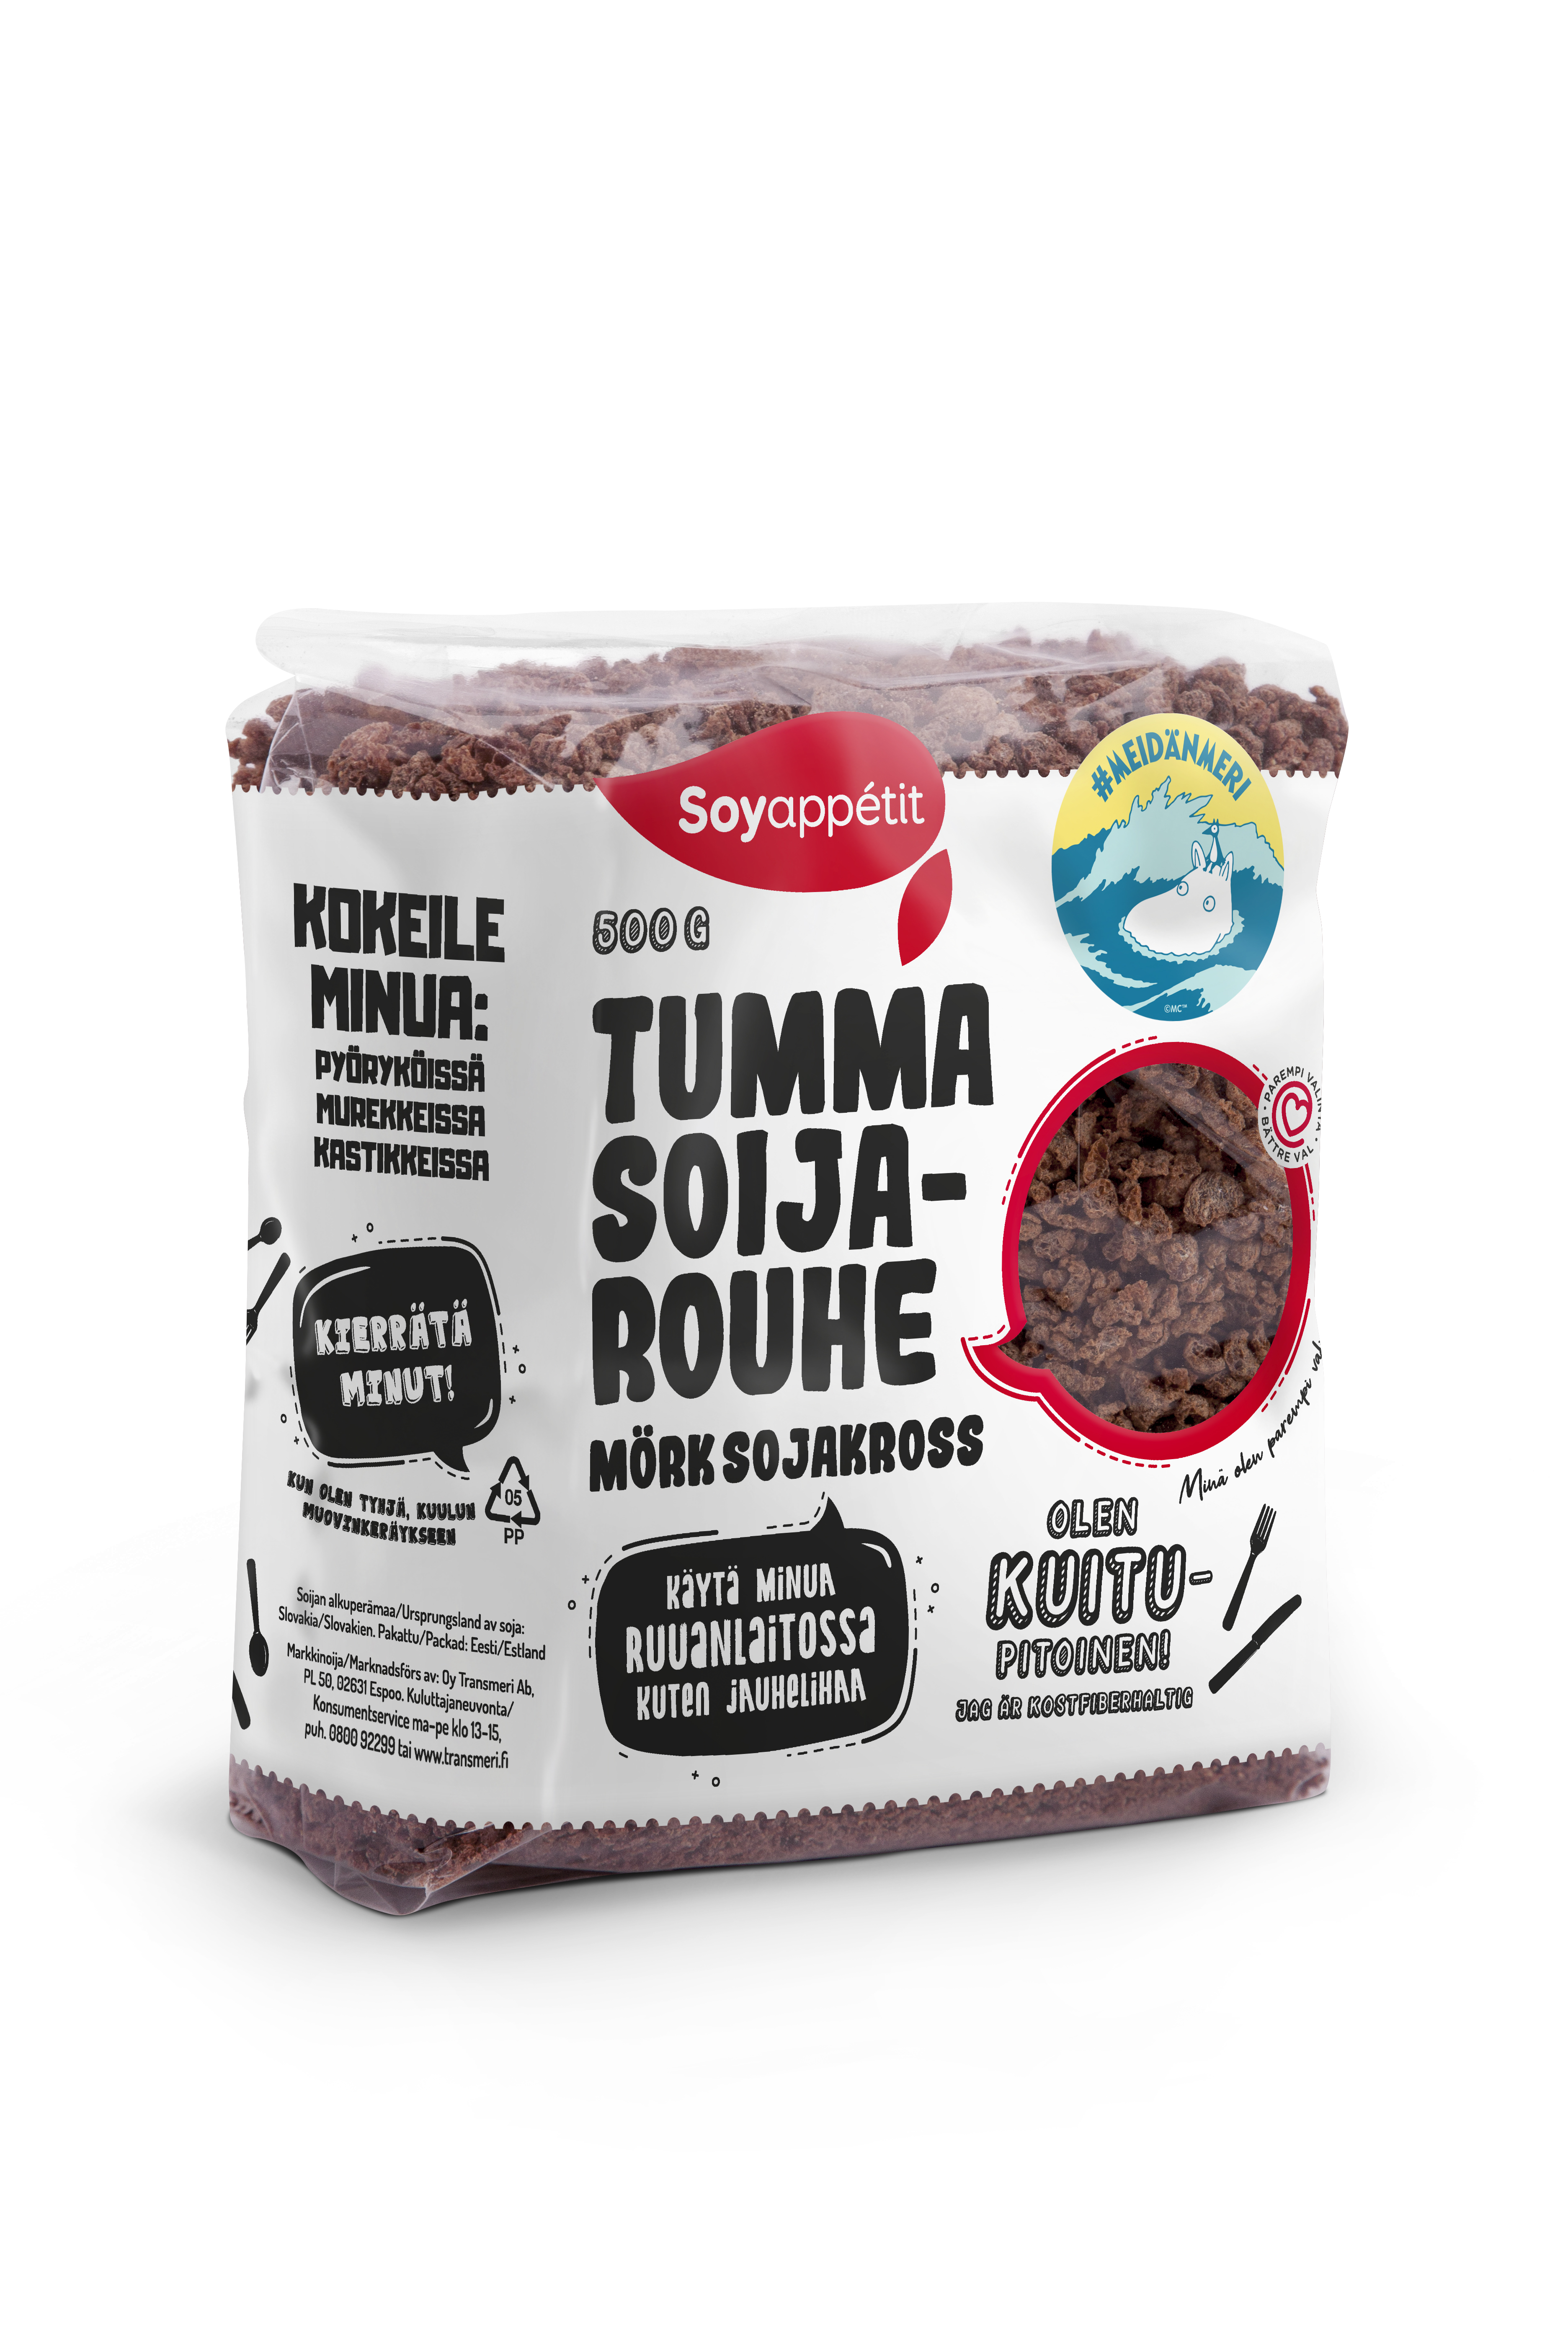 Soyappétit Dark soy protein granules 500g